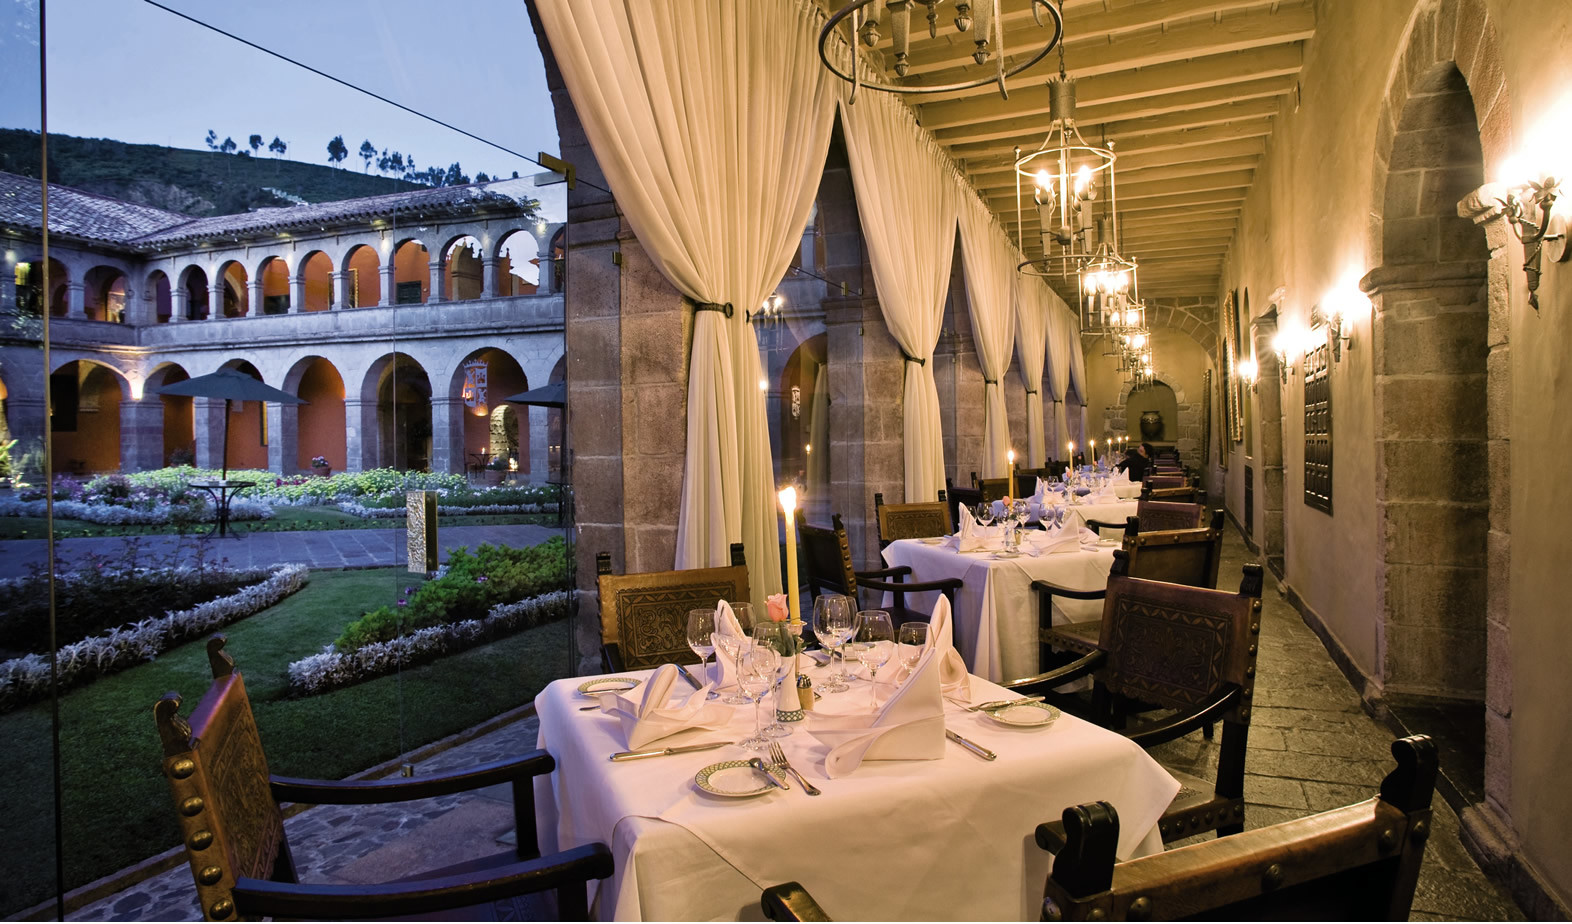 Belmond Hotel Monasterio - Cuzco, Peru